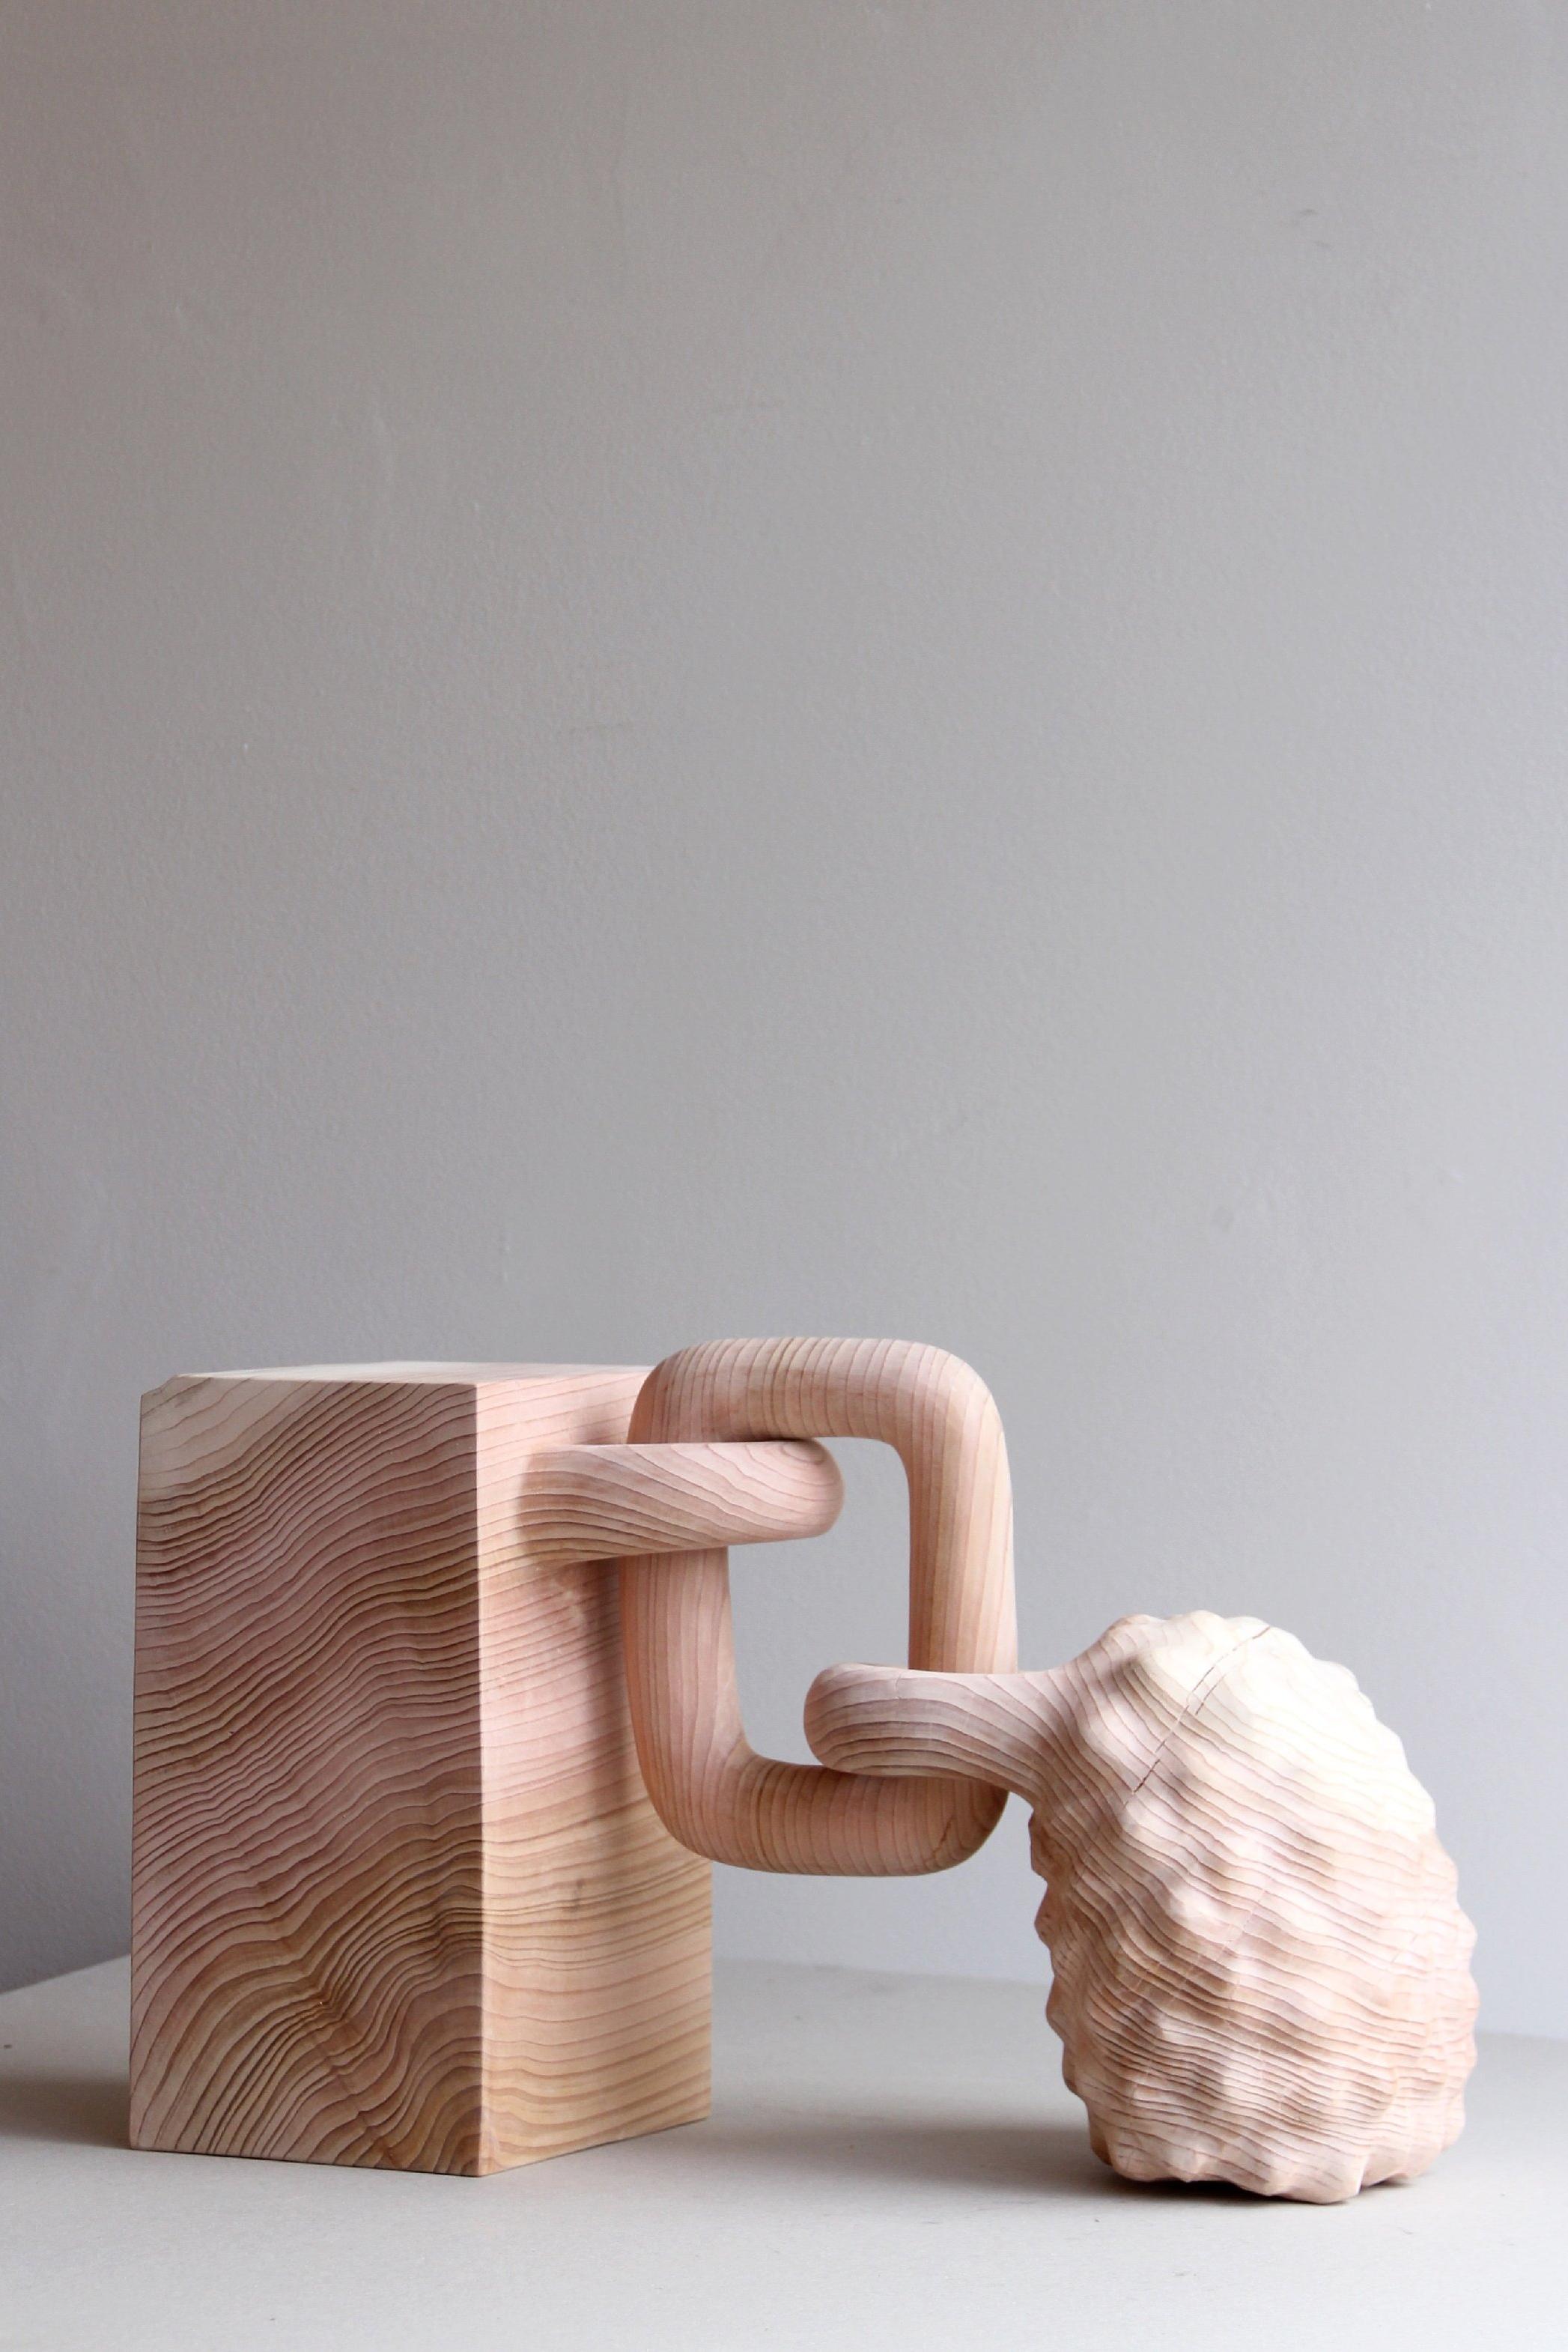 ariele_alasko_sculpture_17.jpg